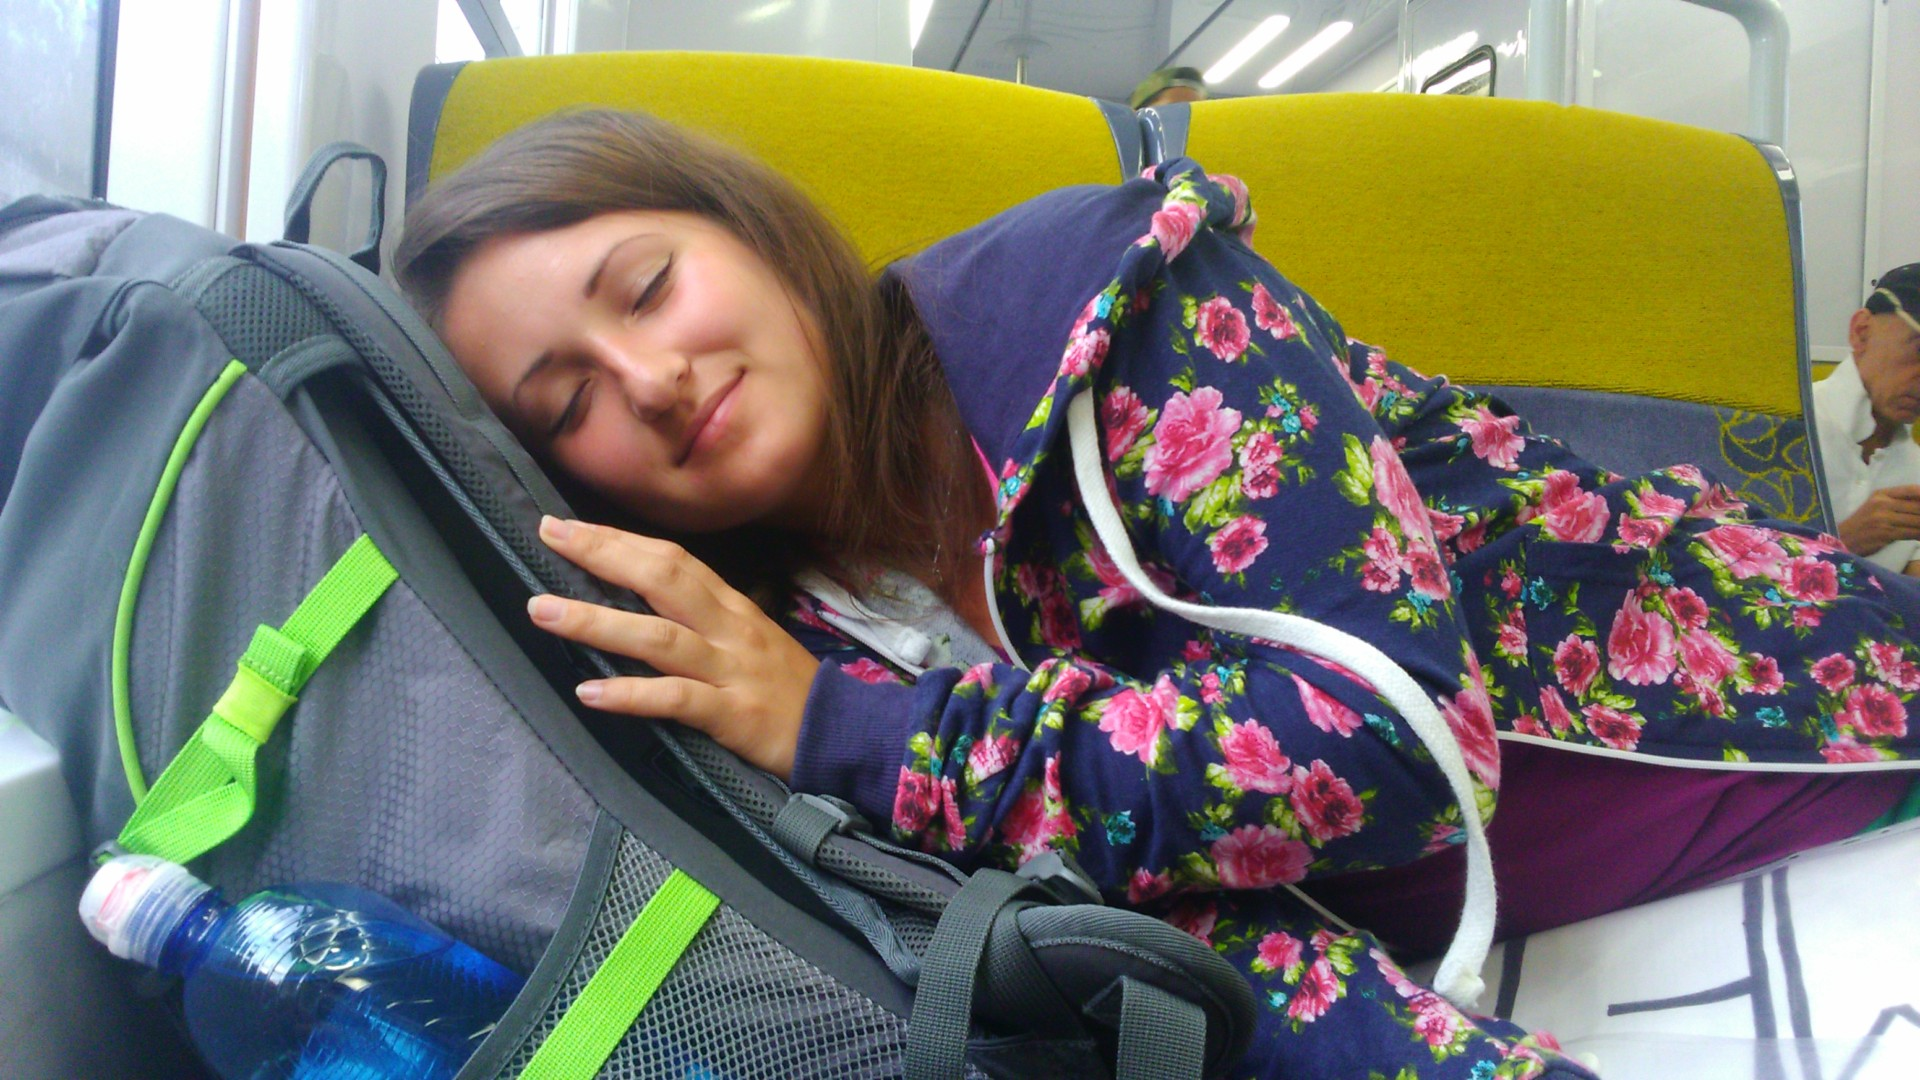 spim v metru